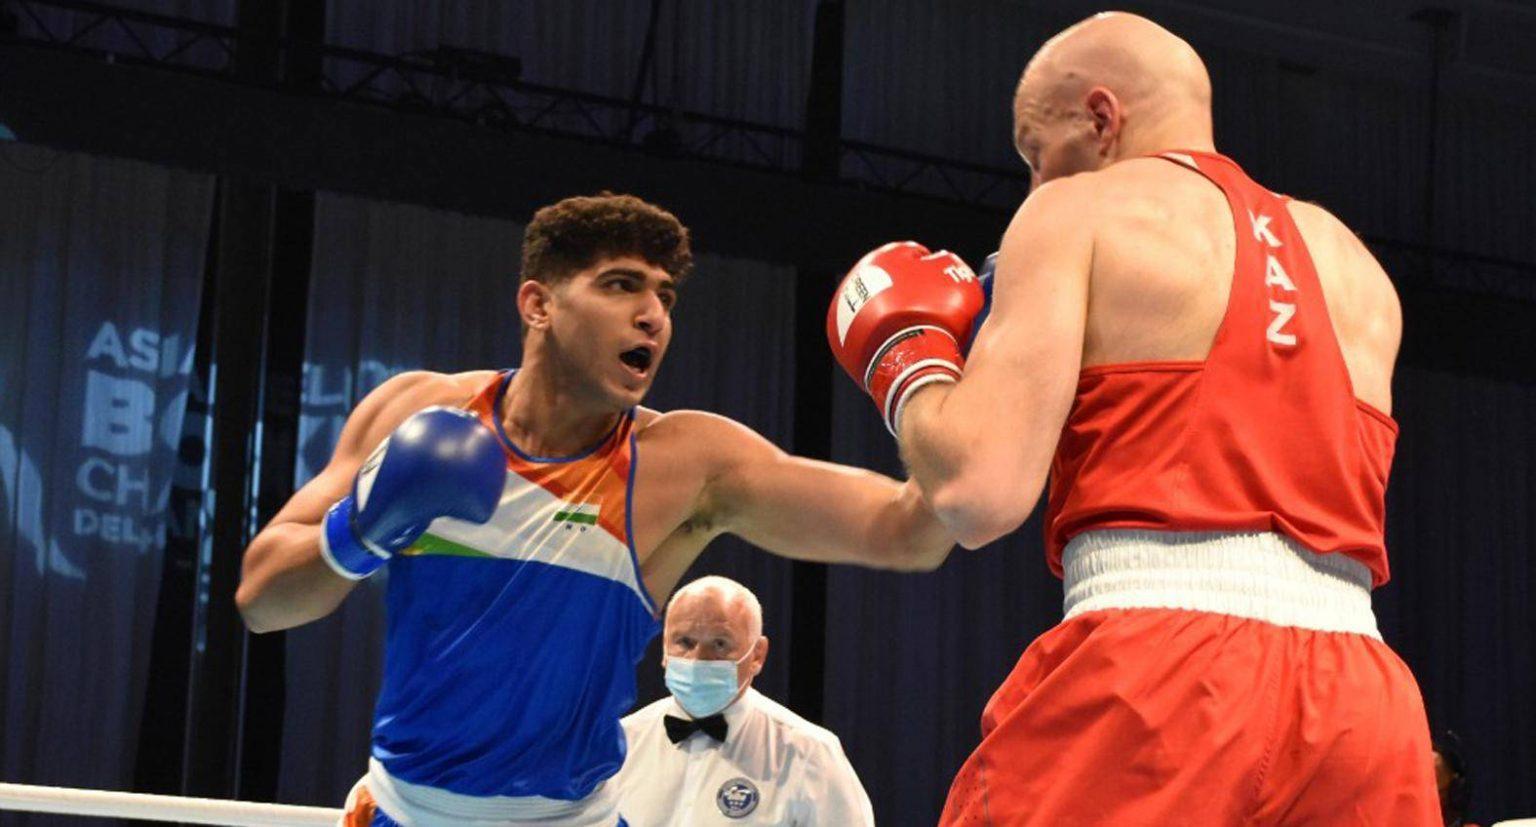 Asian Boxing Championship: India's Sanjeet Kumar wins gold medal | ഏഷ്യൻ ബോക്സിംഗ് ചാമ്പ്യൻഷിപ്പ്: ഇന്ത്യയുടെ സഞ്ജിത് കുമാർ സ്വർണ്ണ മെഡൽ നേടി_40.1